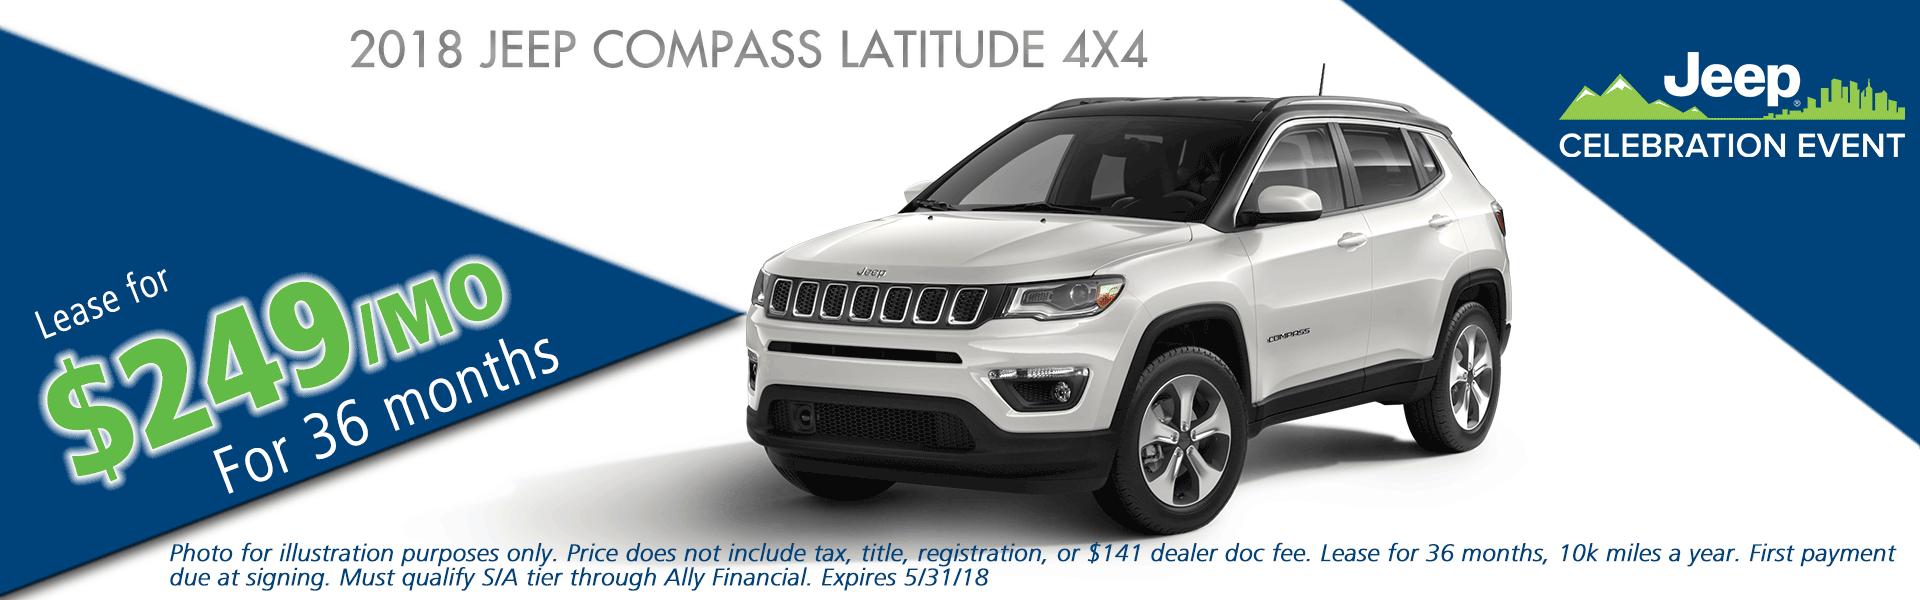 NEW 2018 JEEP COMPASS LATITUDE 4X4 CarRight Chrysler Jeep Dodge Ram Fuso moon, pittsburgh, sewickley, pennsylvania.